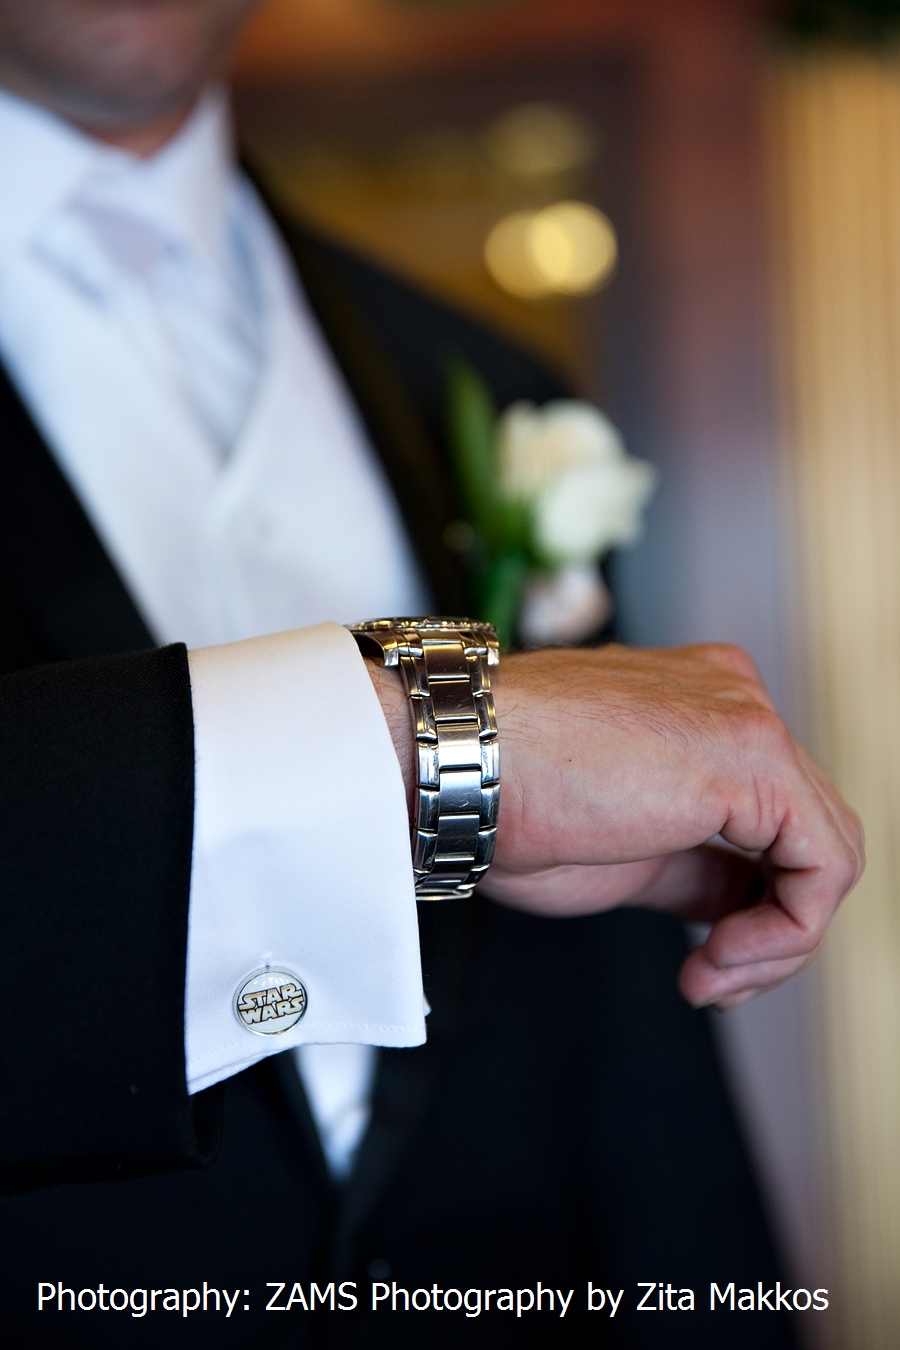 b_romine_b_arium_breaking_bad_cuff_links_men_wedding_cufflinks_2.jpg